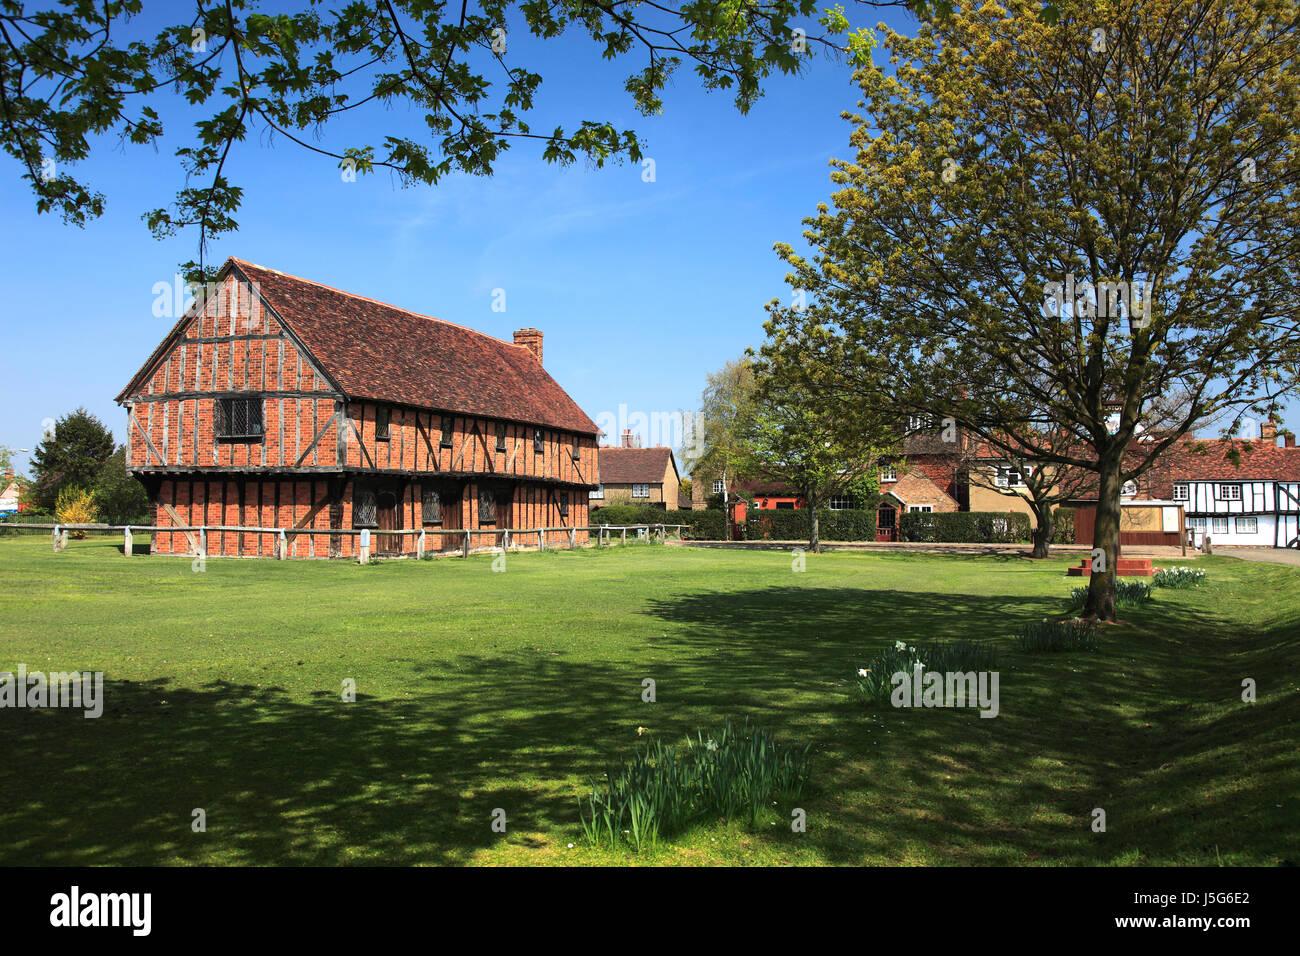 Spring, the Moot Hall; Elstow village; John Bunyans birthplace; Bedfordshire, England, UK Stock Photo